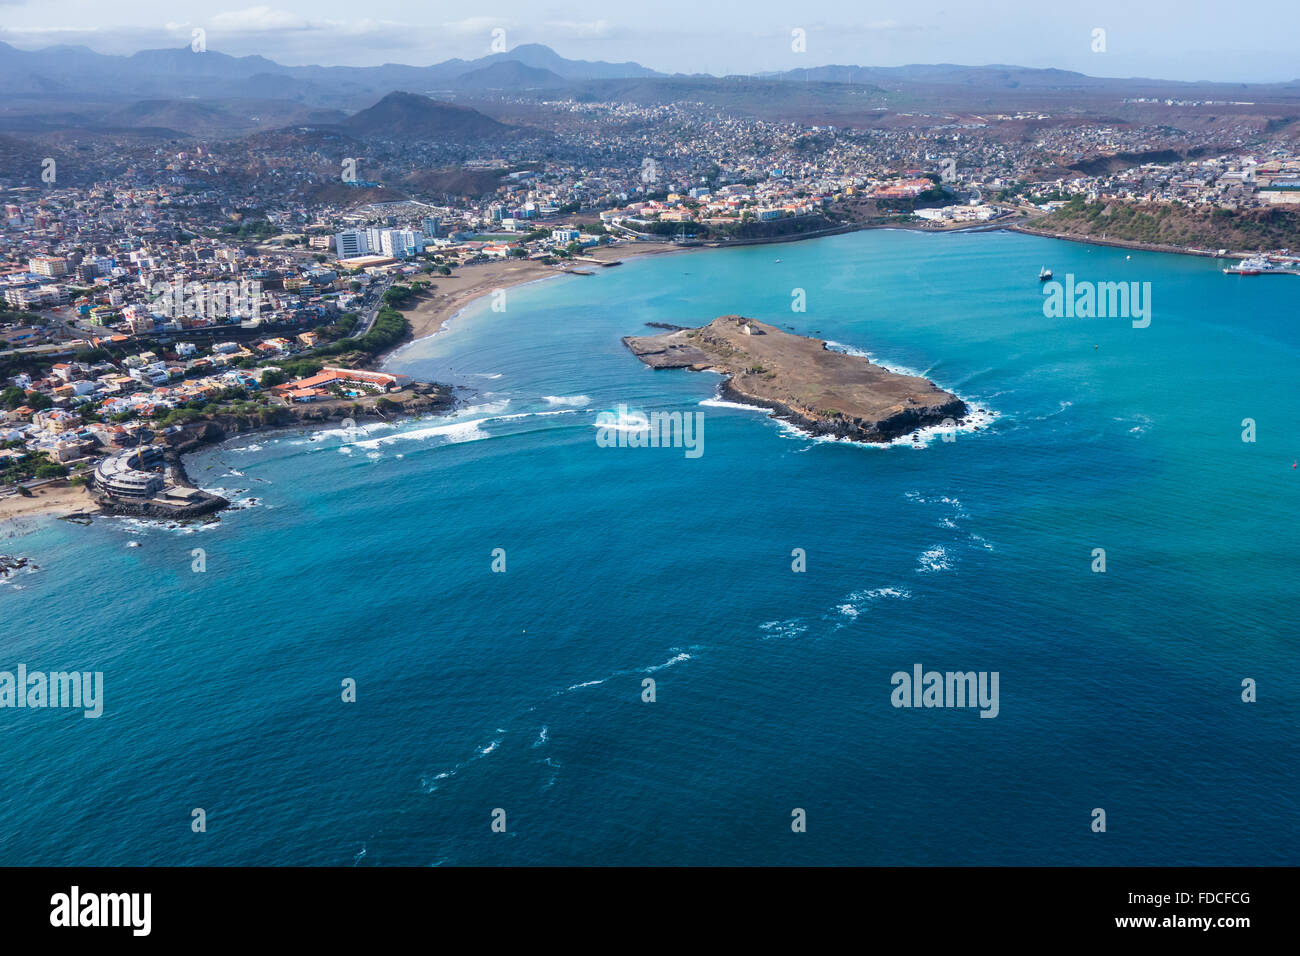 Cape Verde Islands Capital City